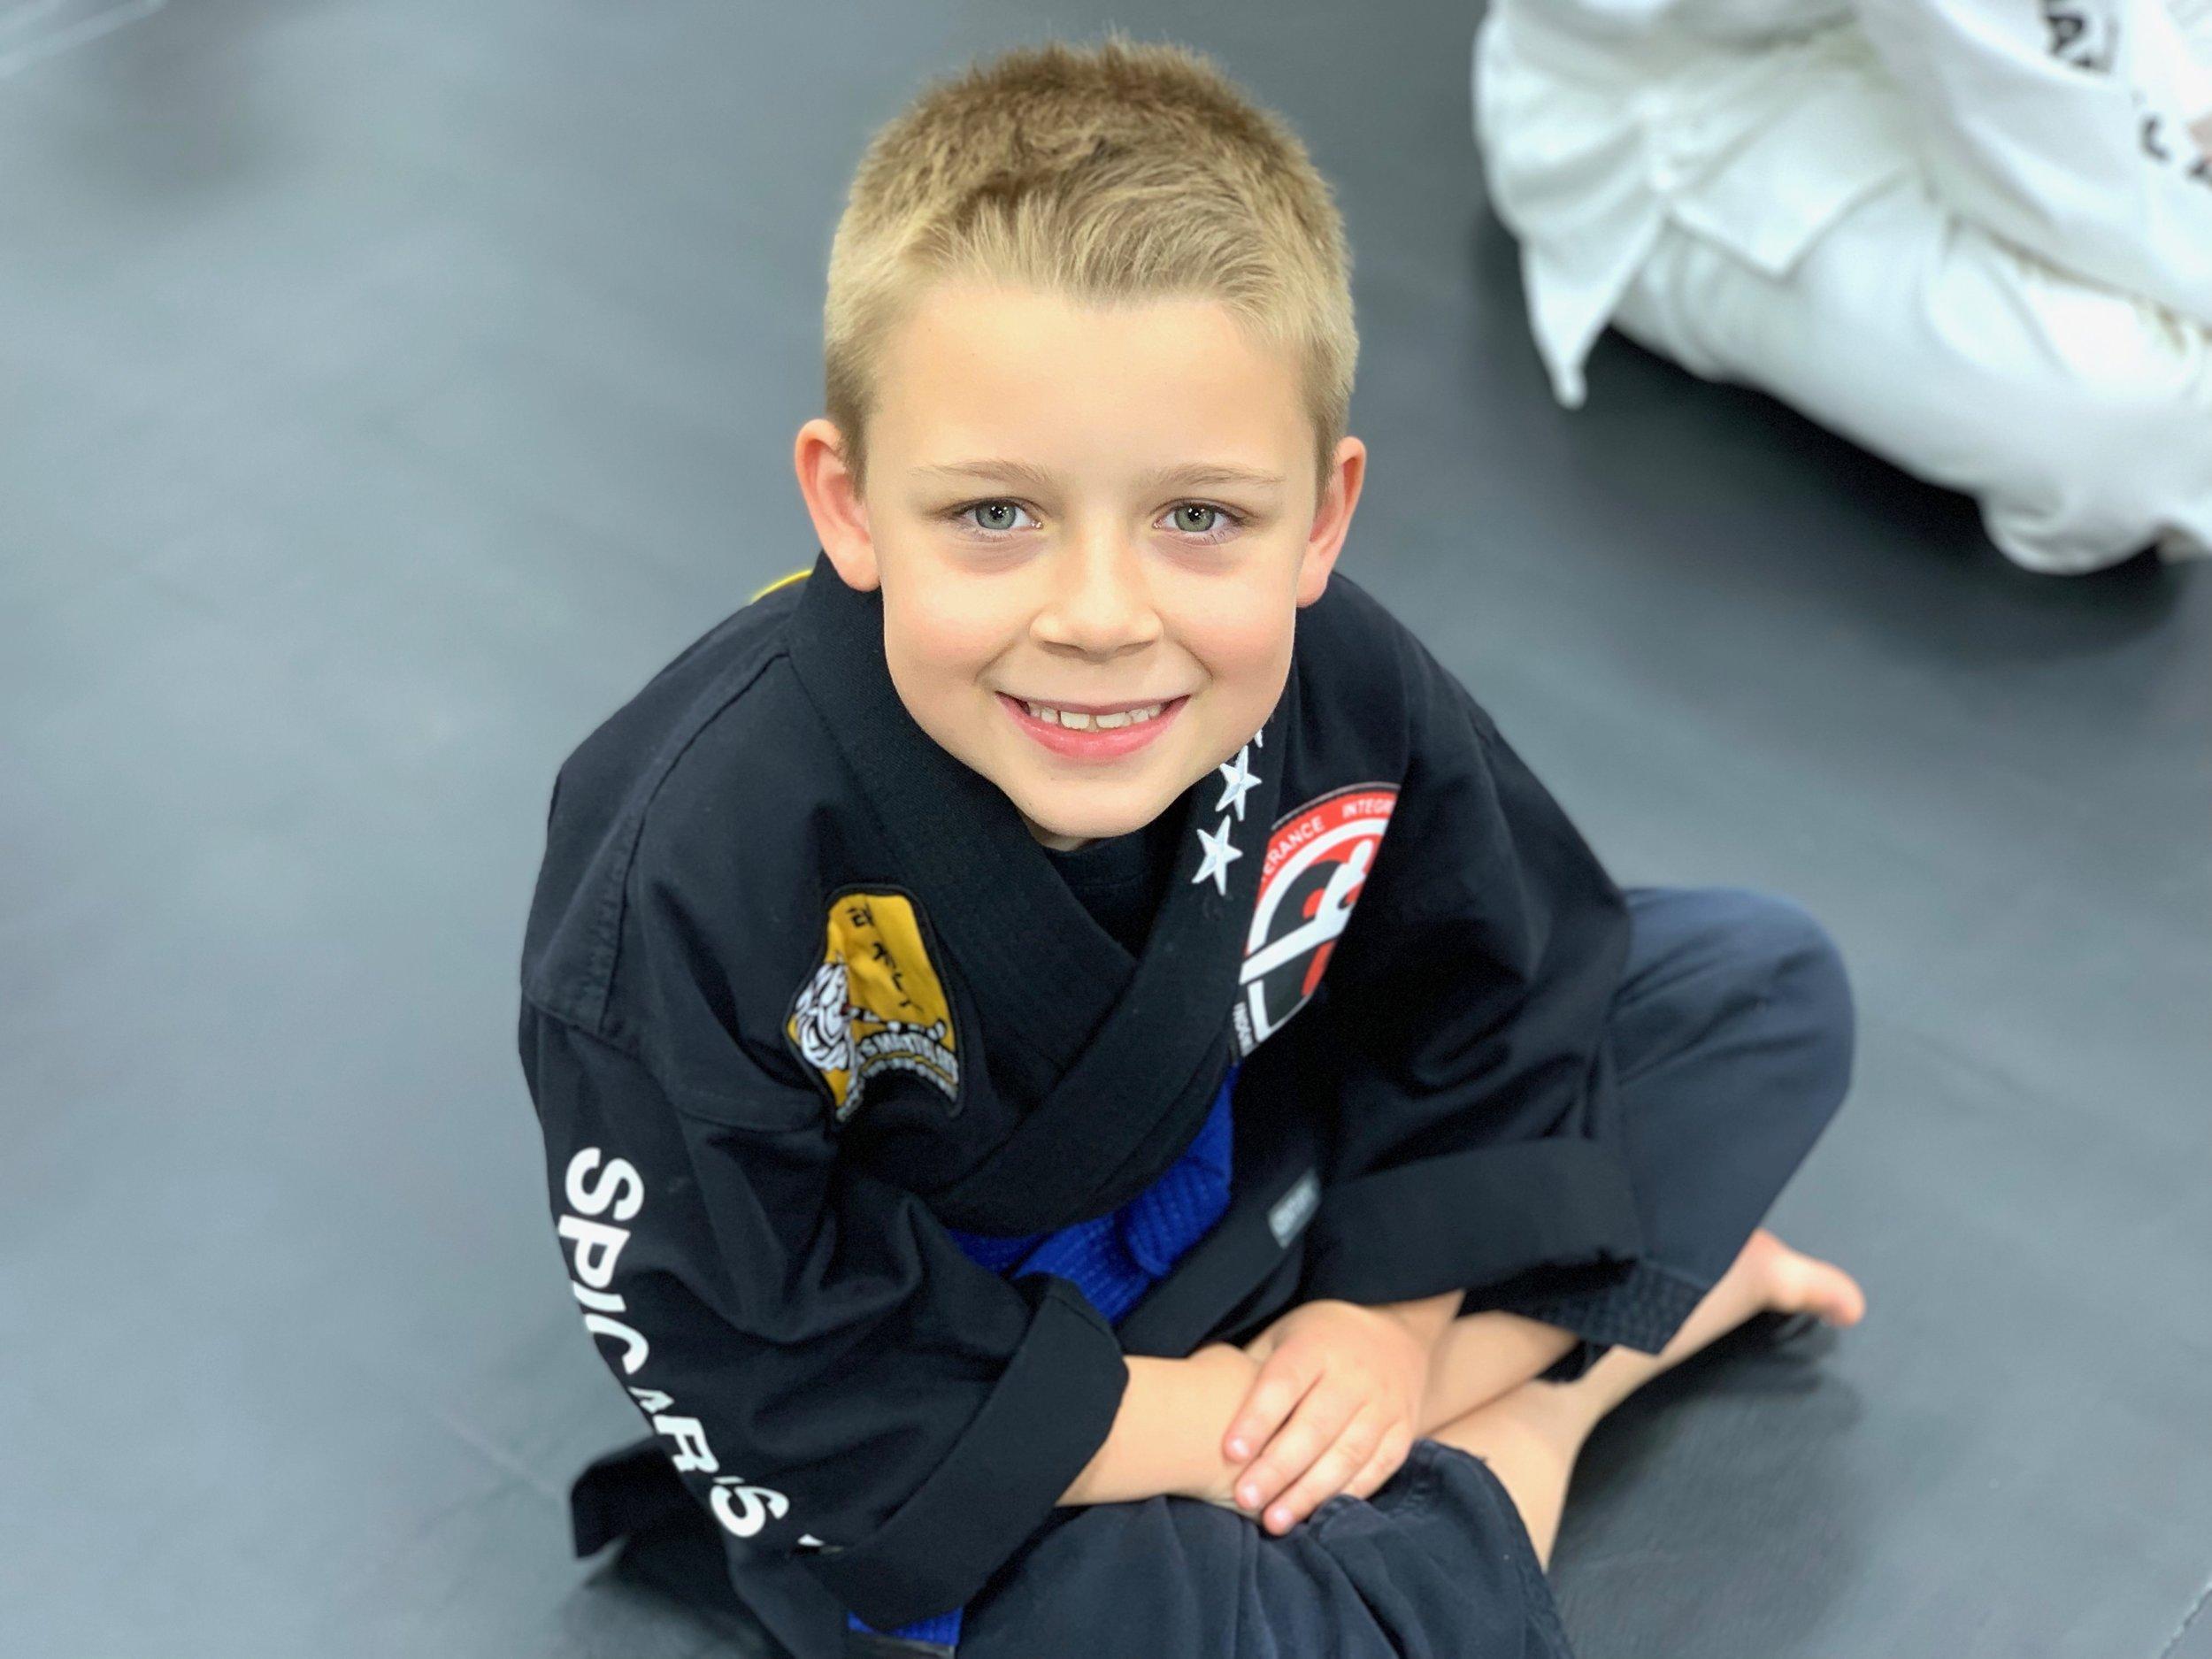 karate-kids-program-souhtlake-keller-grapevine-texas00031.jpeg